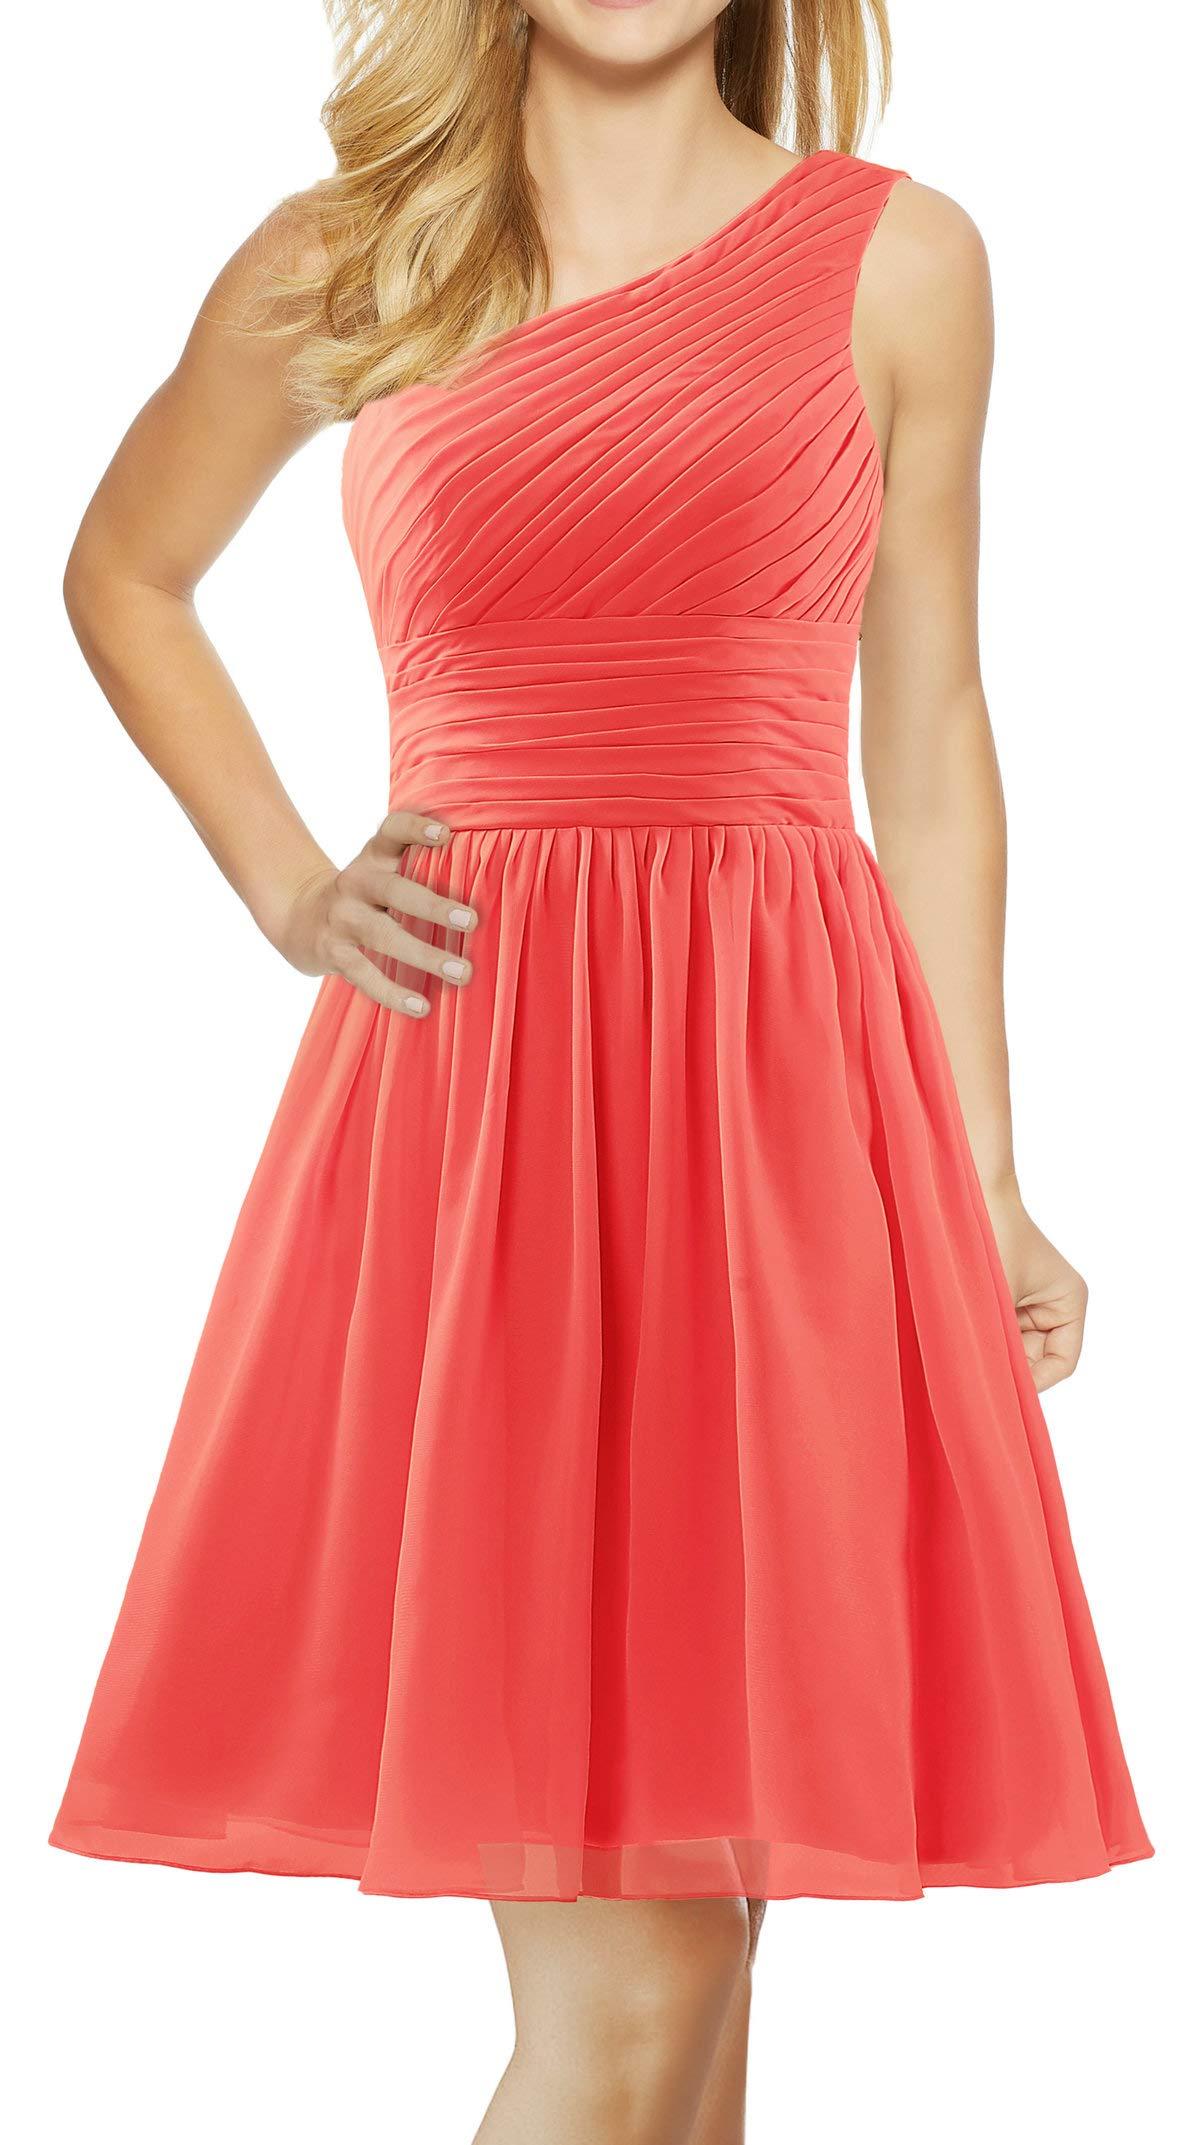 Available at Amazon: ANTS Women's Chiffon One Shoulder Bridesmaid Dresses Short Evening Dress